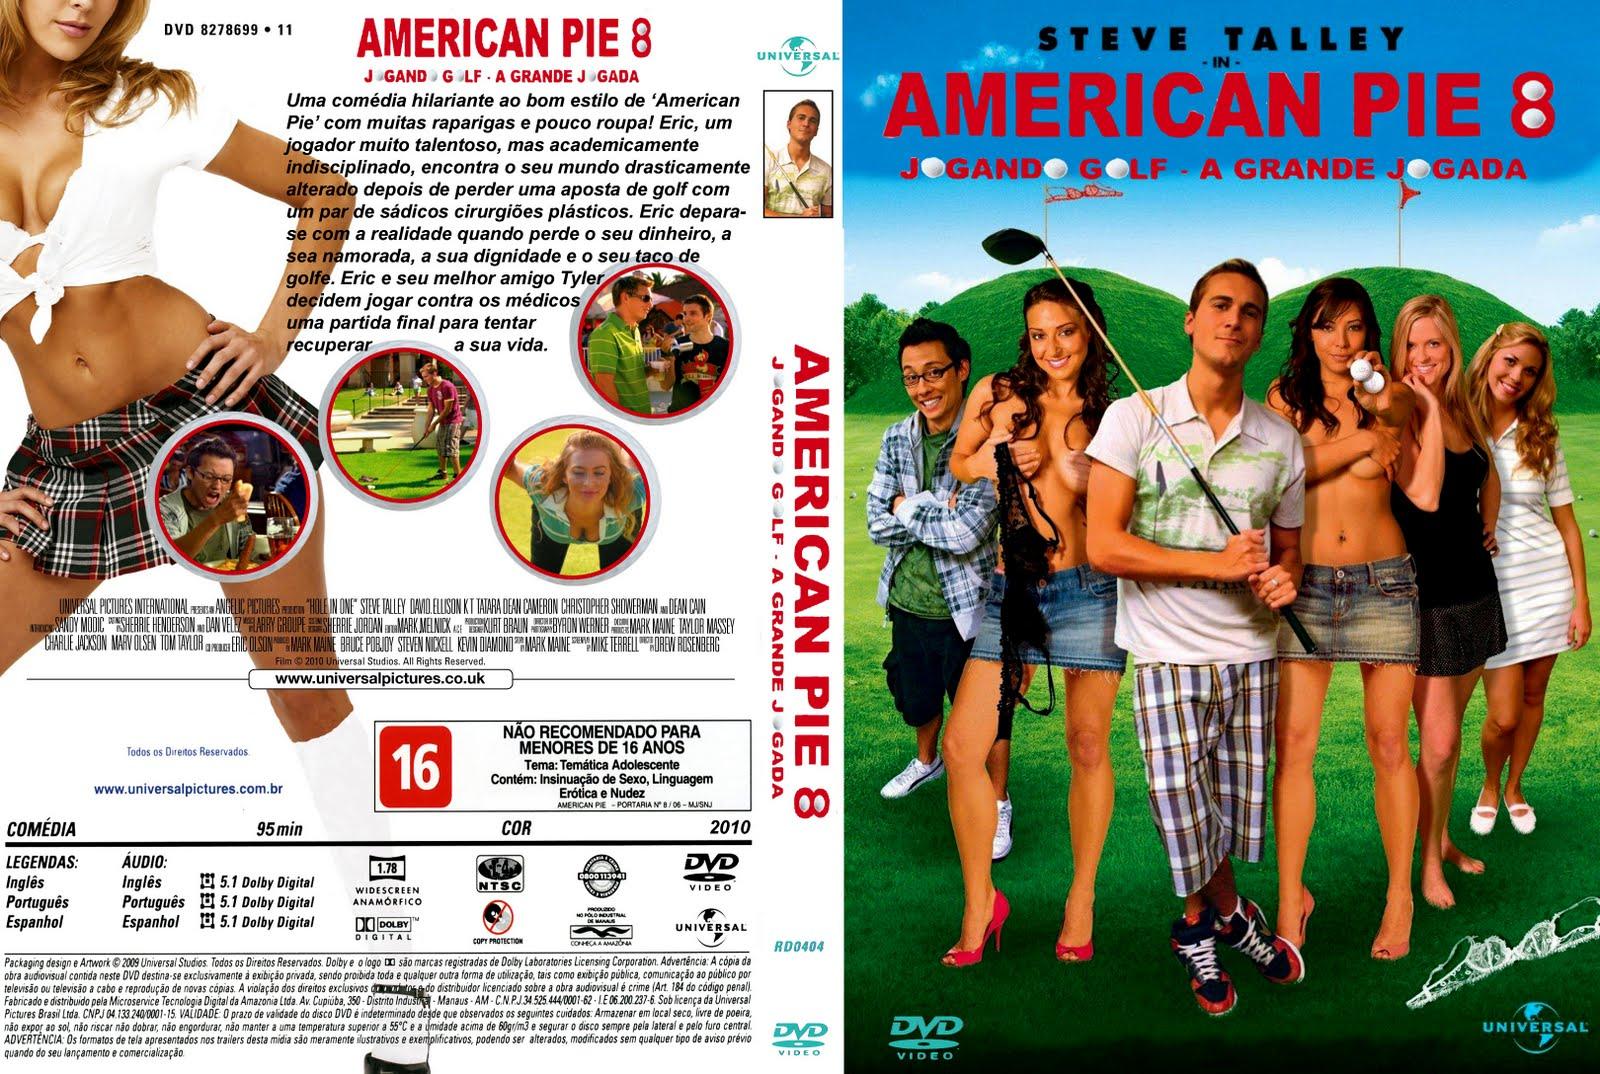 American Pie 8